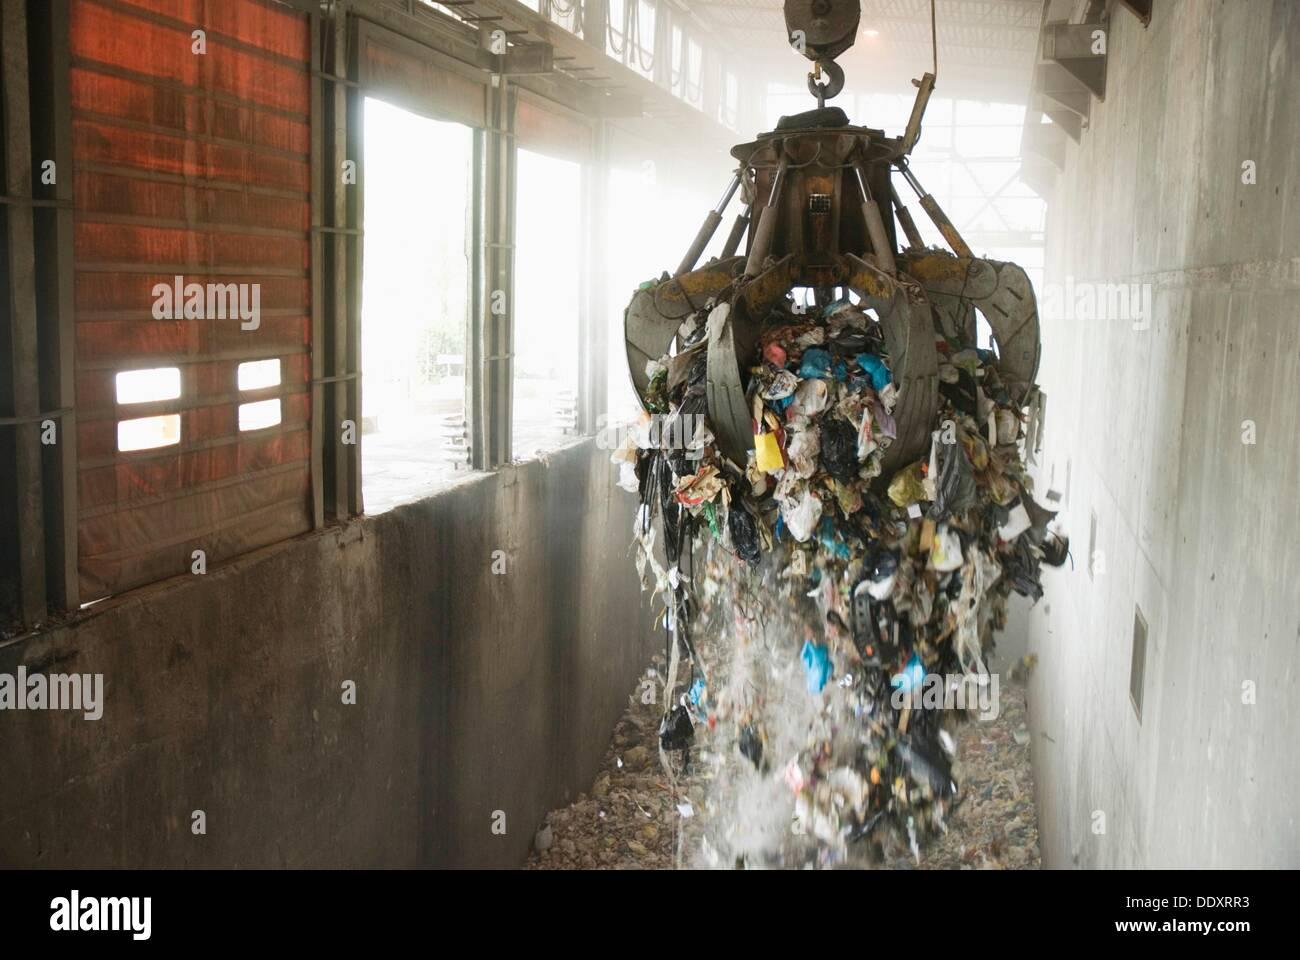 Valdemingomez waste treatment centre, Madrid, Spain. - Stock Image